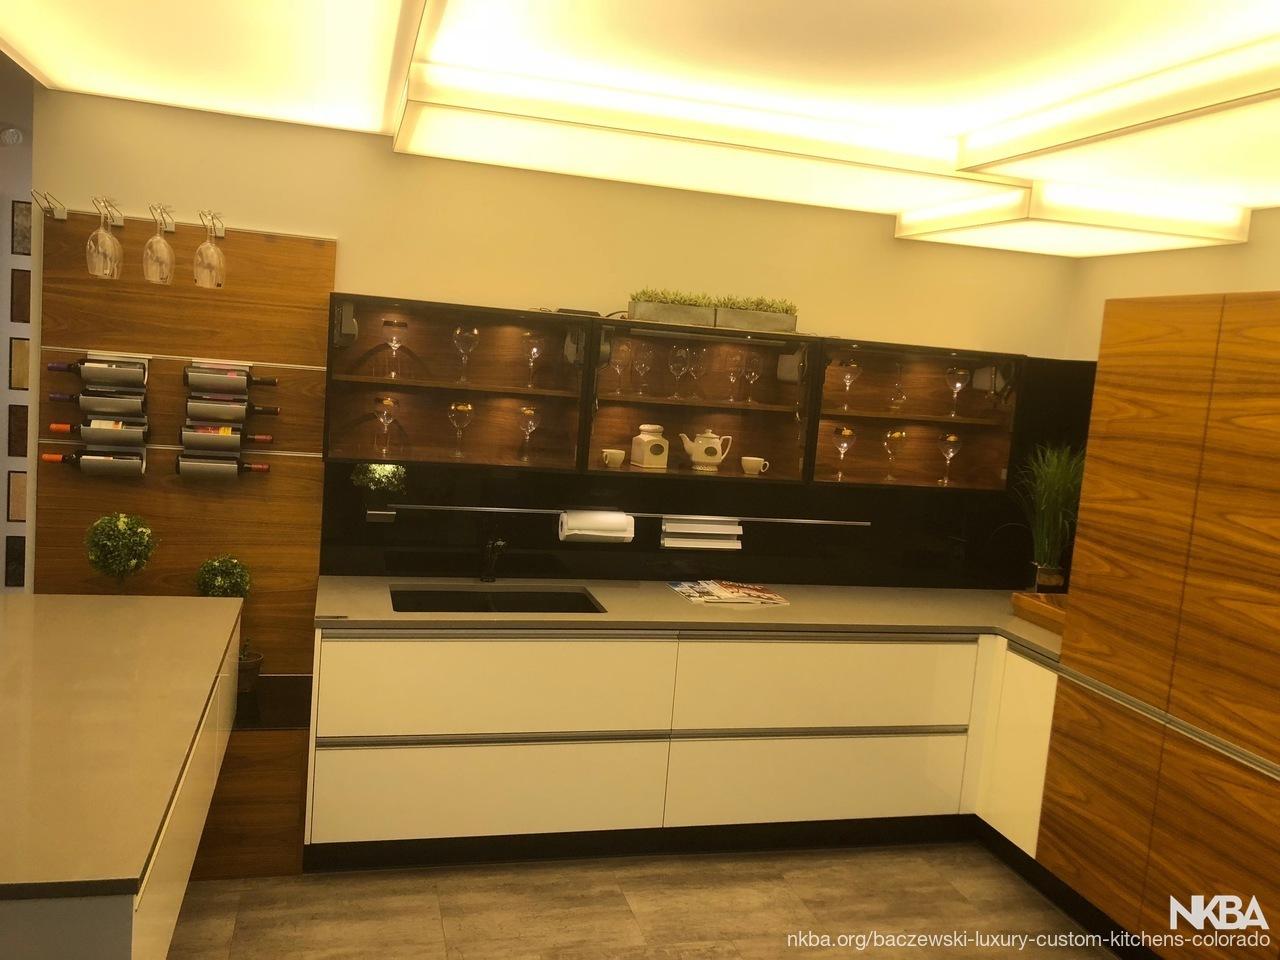 Custom Kitchens Denver Colorado - NKBA